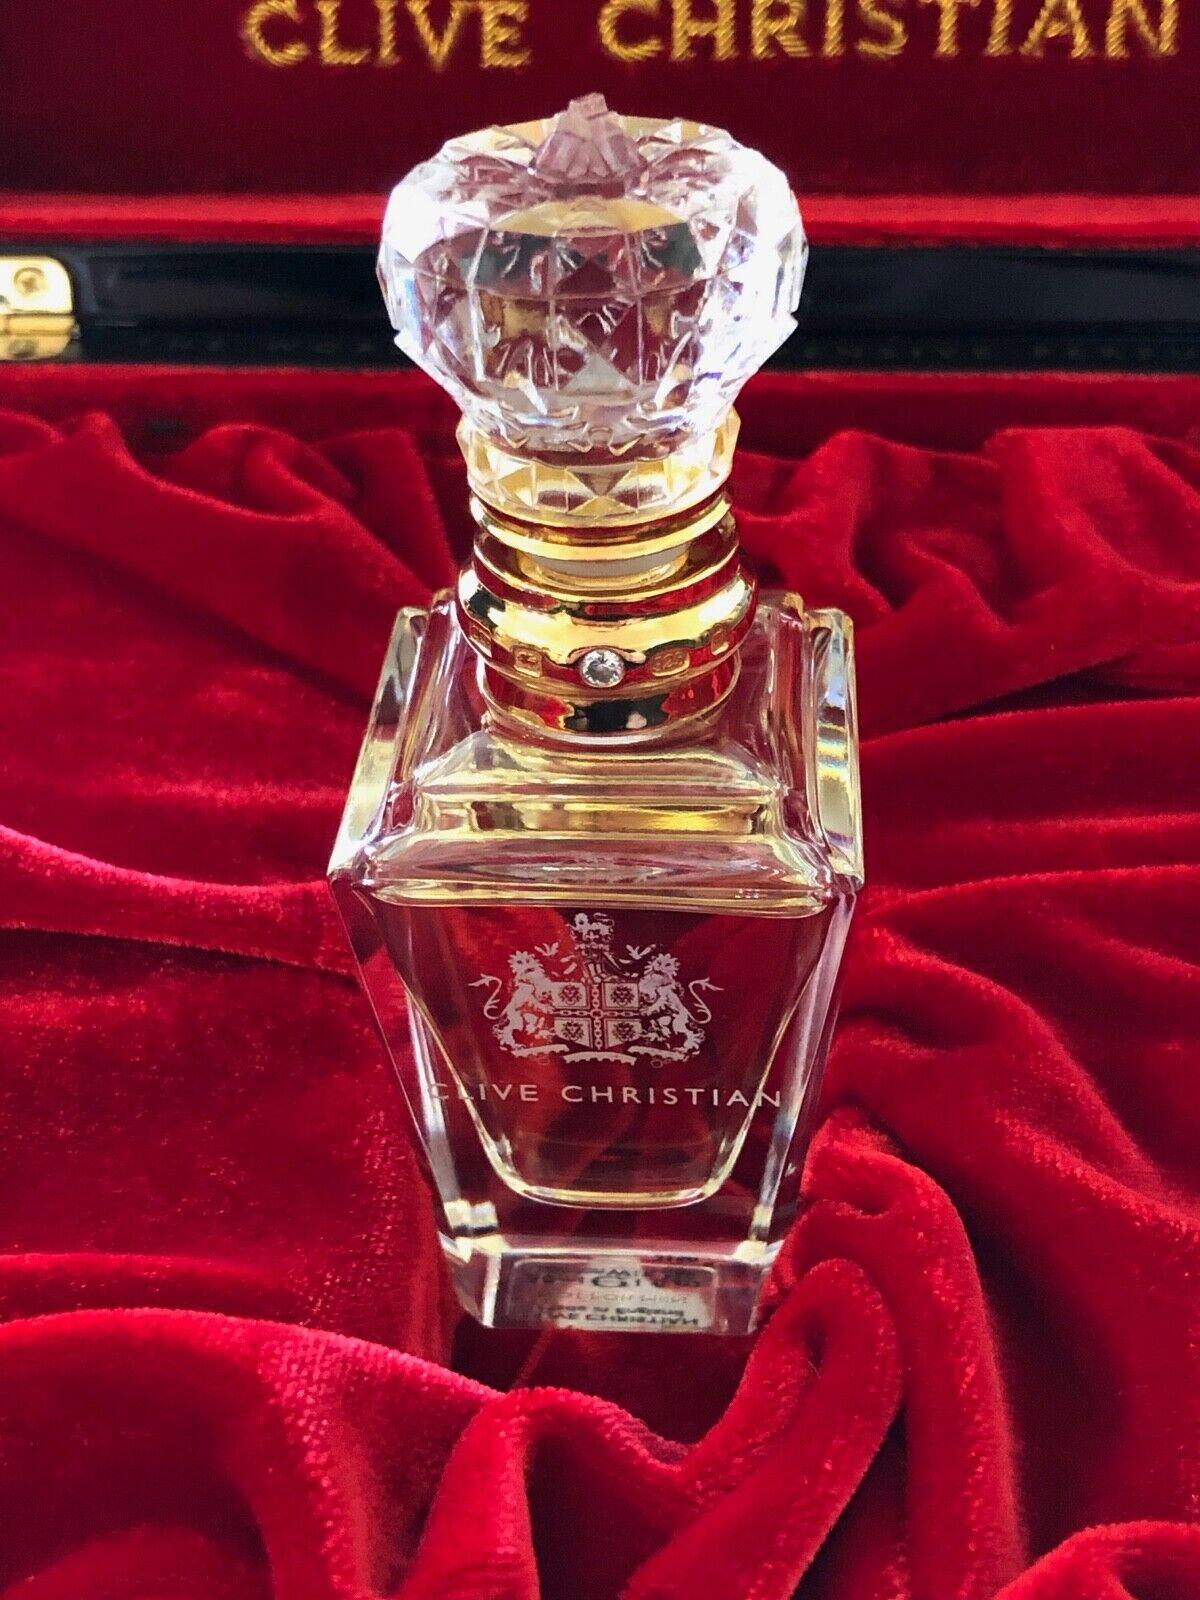 Genuine Clive Christian No. 1 Pure Perfume MEN Crystal Bottl